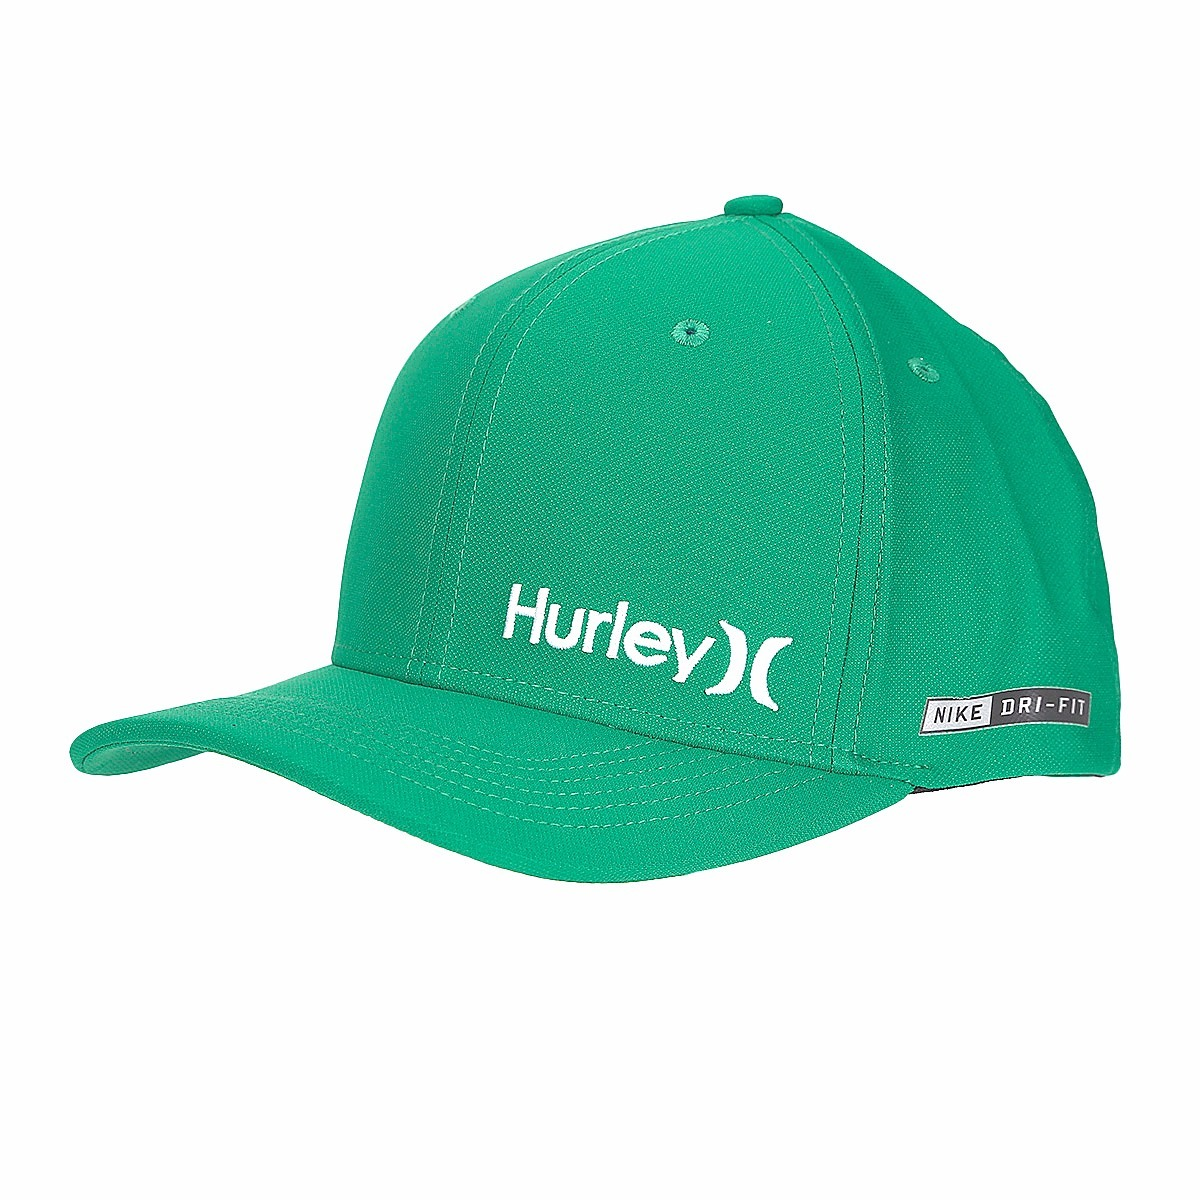 boné hurley original nike dri-fit mini verde. Carregando zoom. 5792b63d369